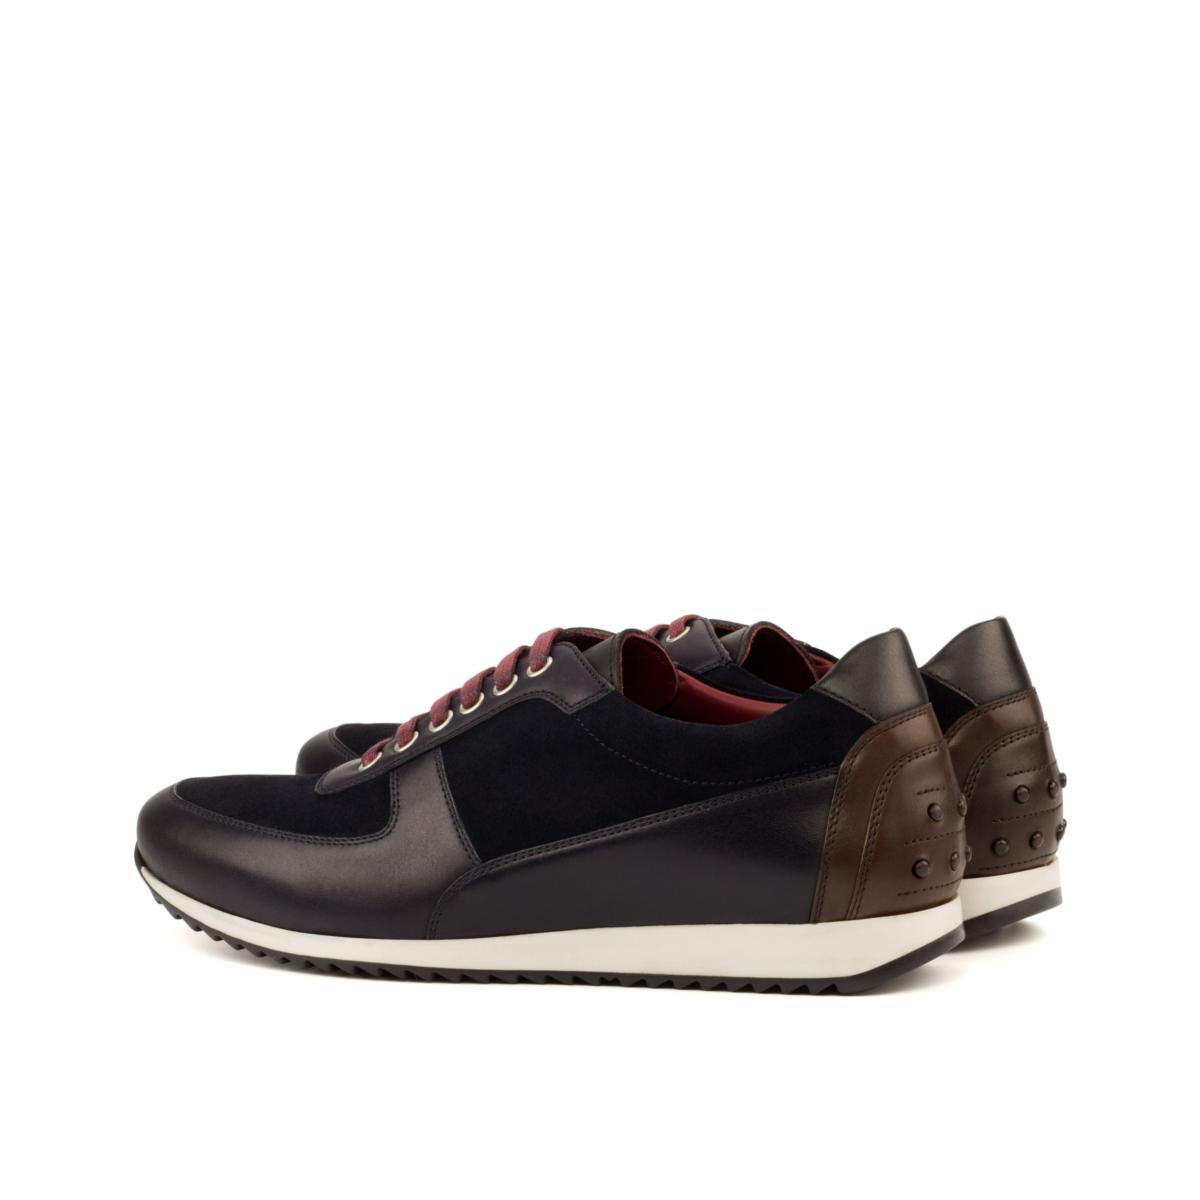 LEO boxcalf and suede corsini sneakers